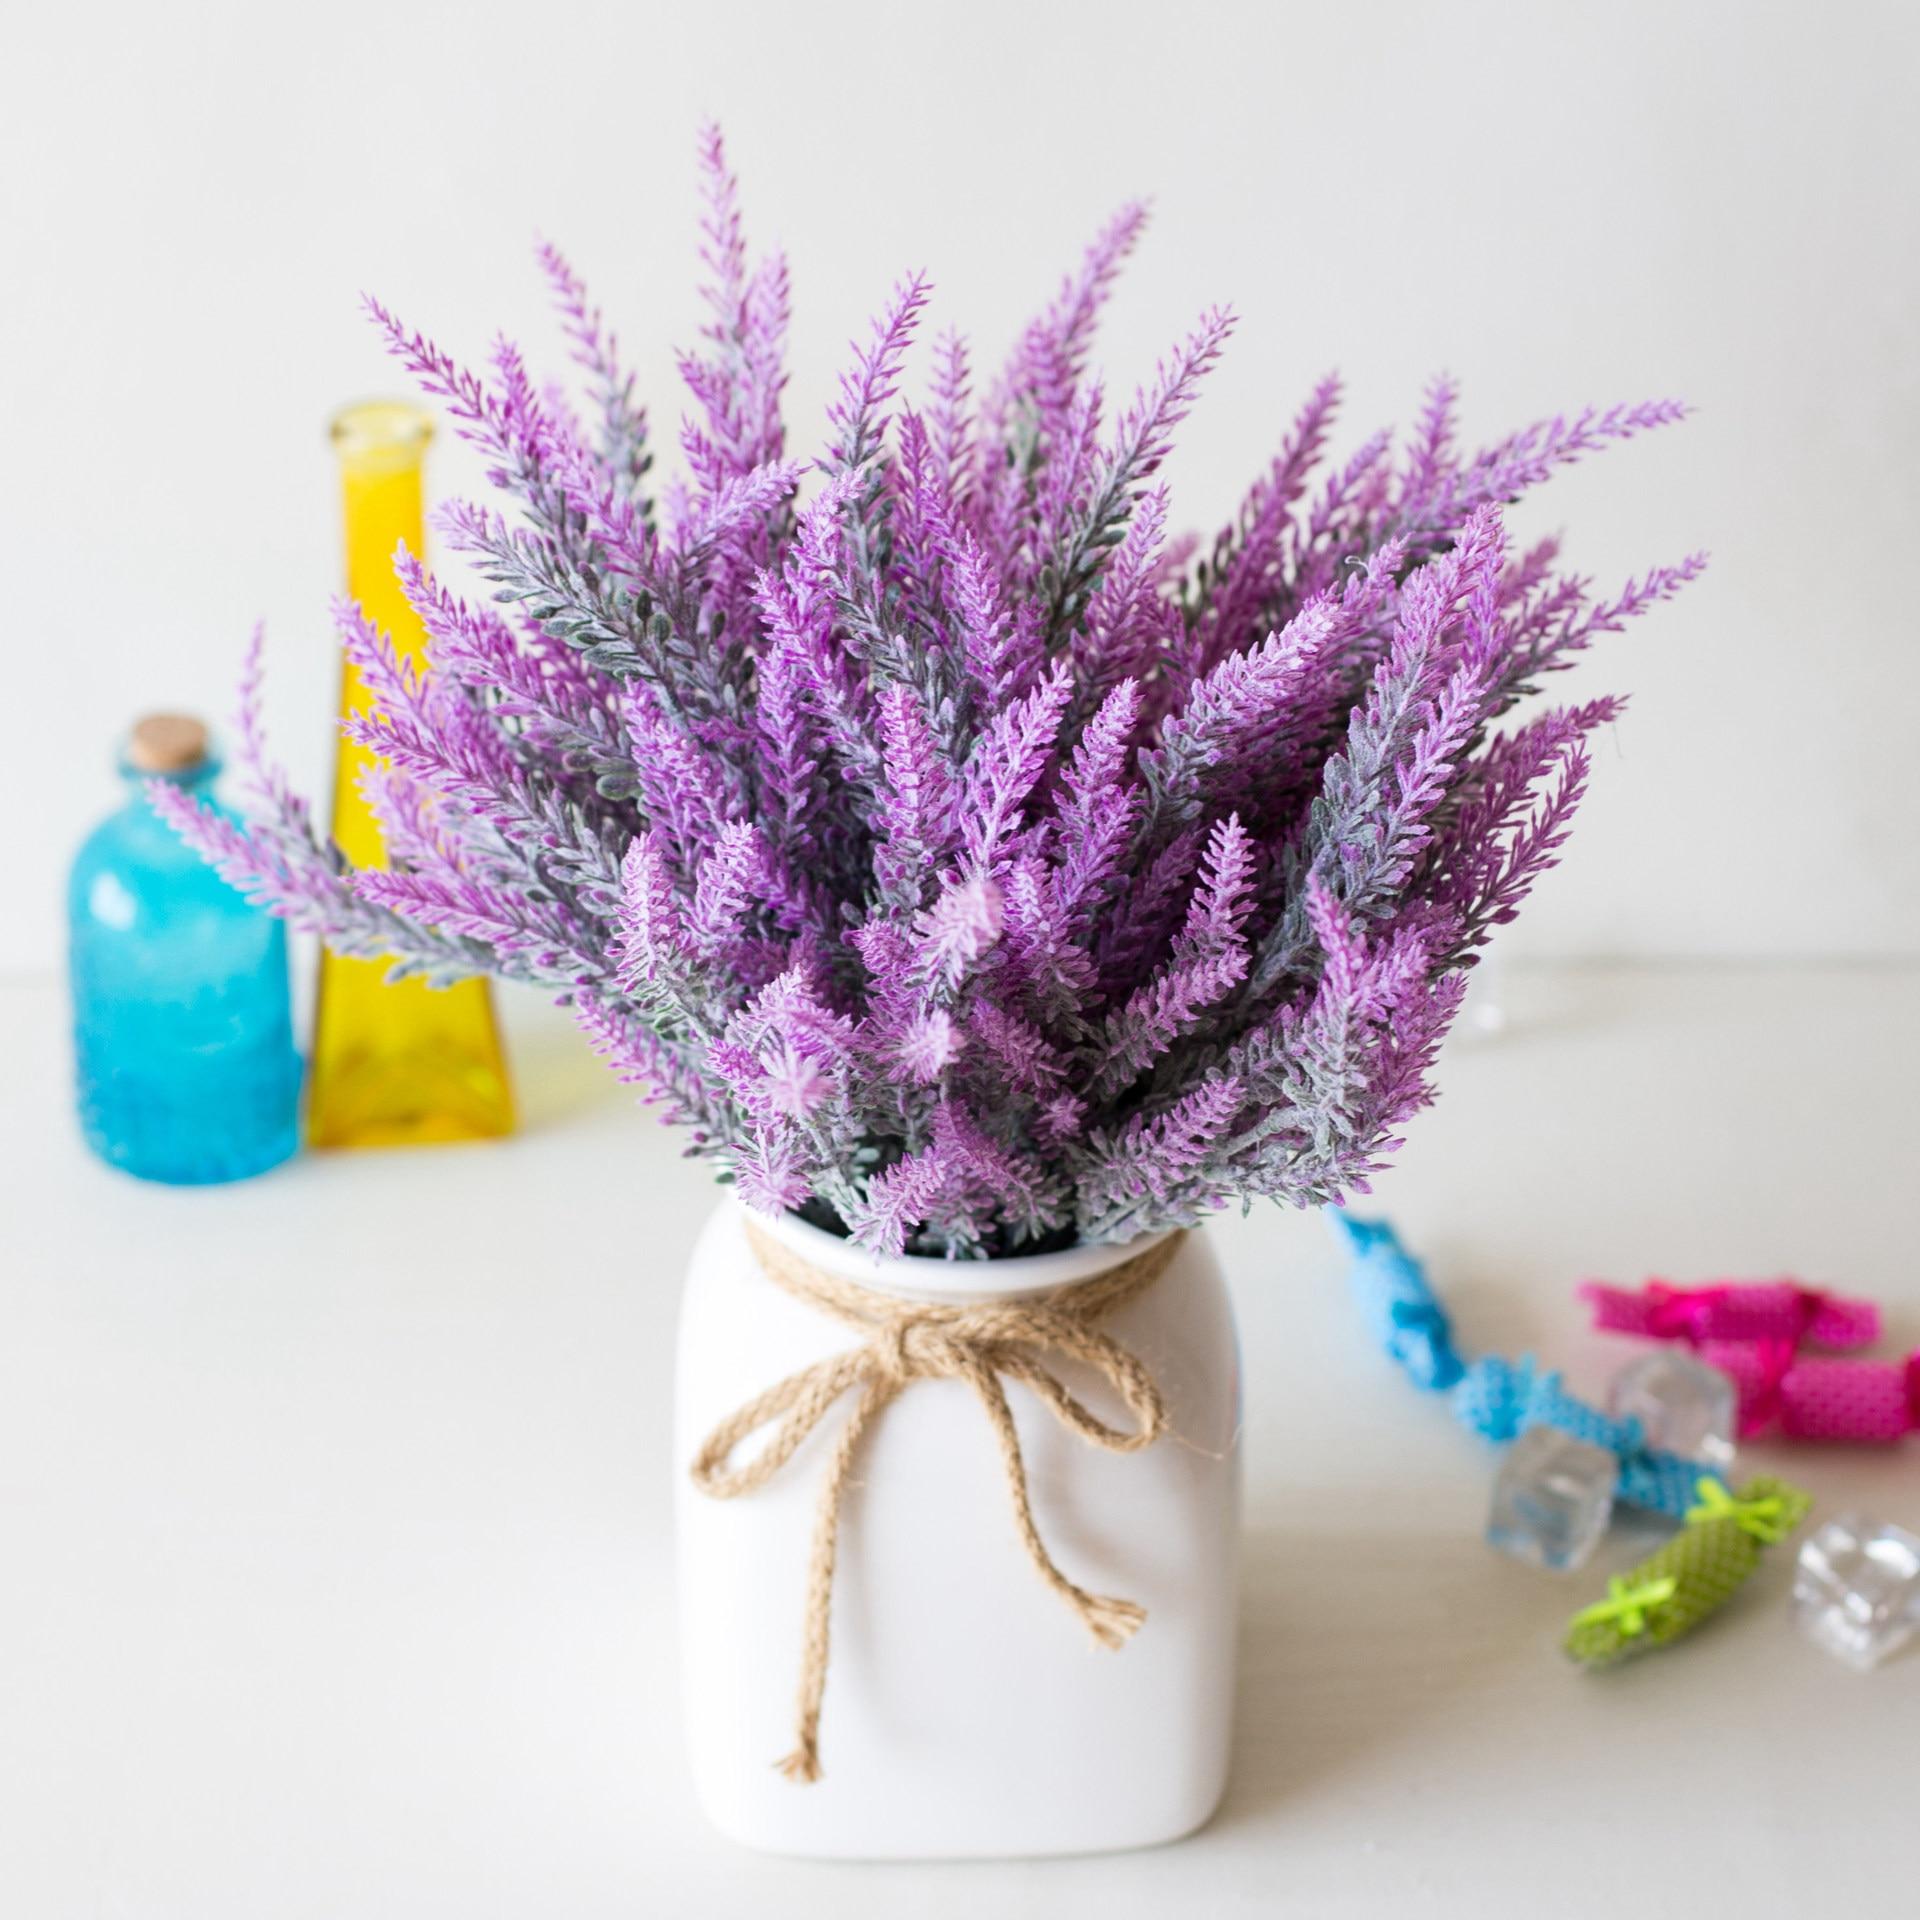 25 Heads Wedding Party Artificial Flowers Lavender Fake Bridal Bouquet Party Home Decor Decorations Artificial Flowers